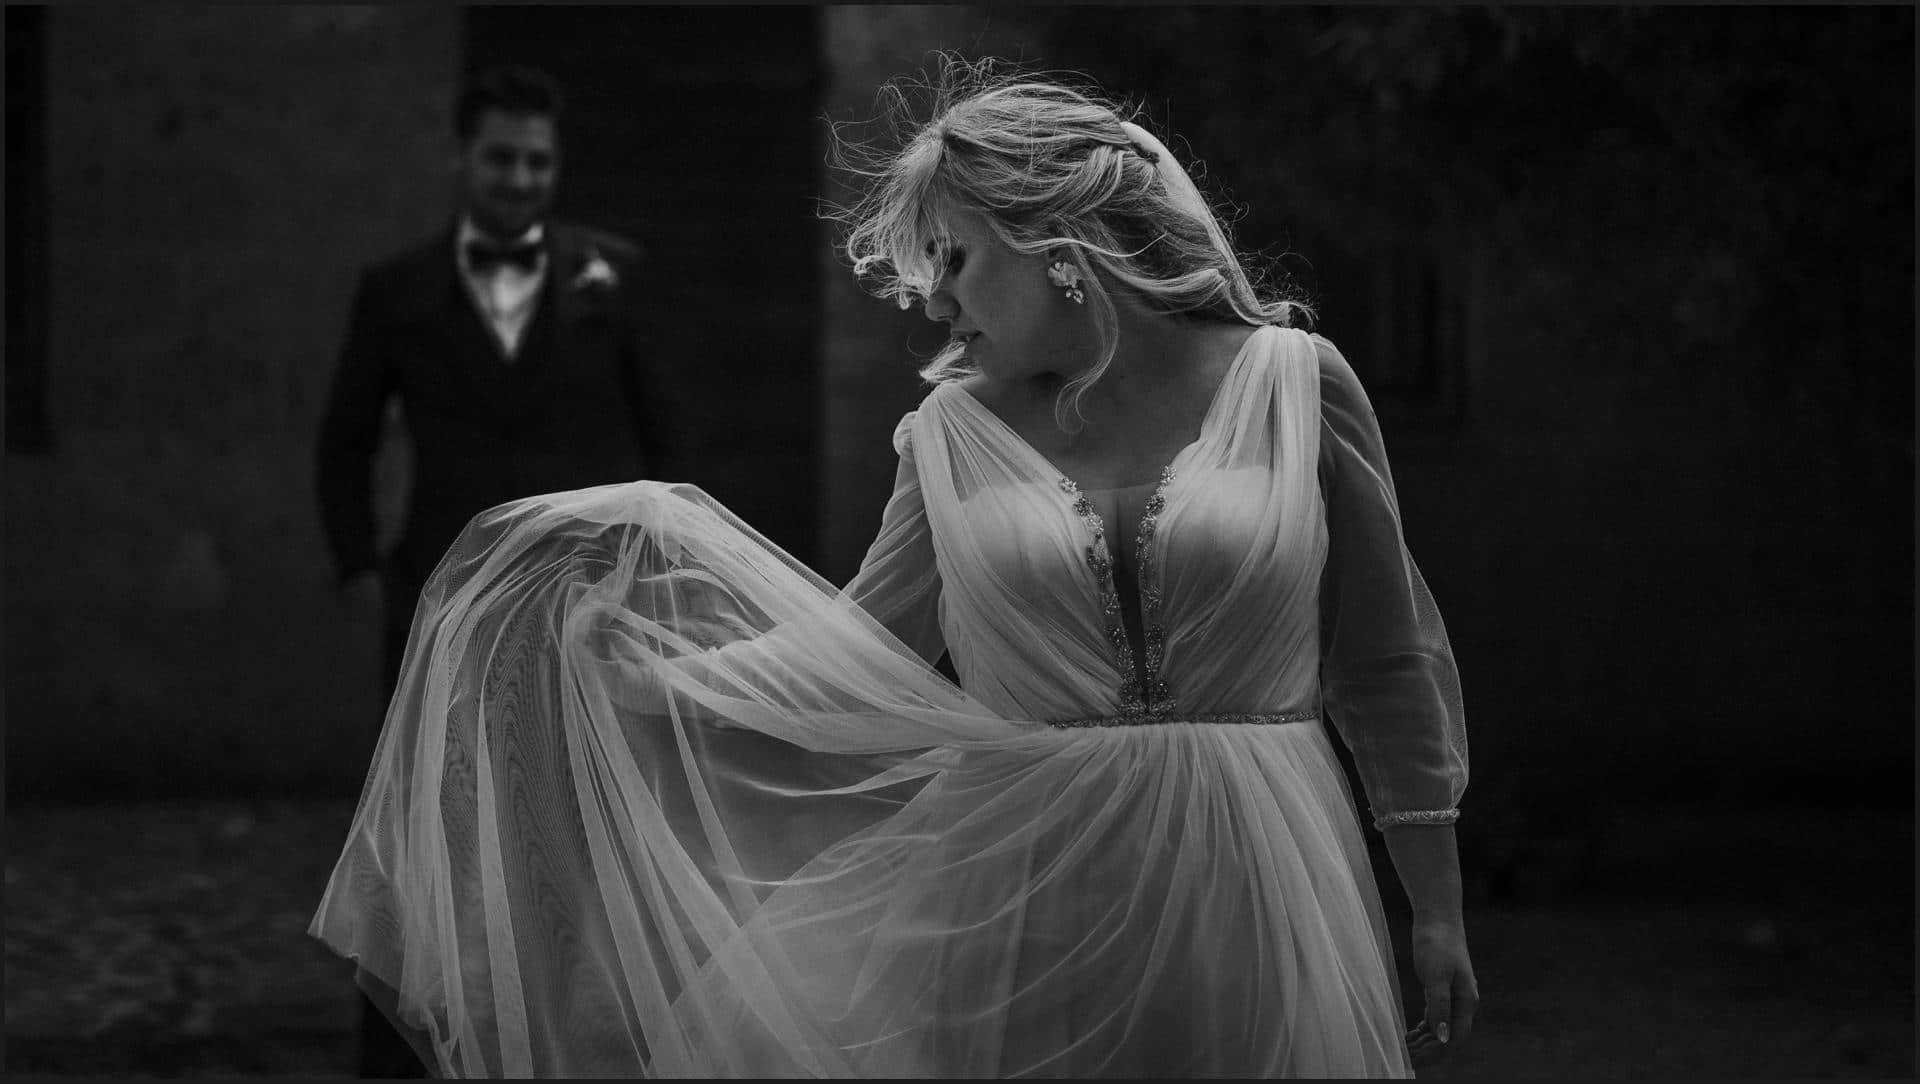 borgo di tragliata, wedding, rome, wedding in rome, bride, groom, black and white, bride dress, intimate wedding, italy wedding photographer, destination wedding in rome, rome wedding photographer, black and white